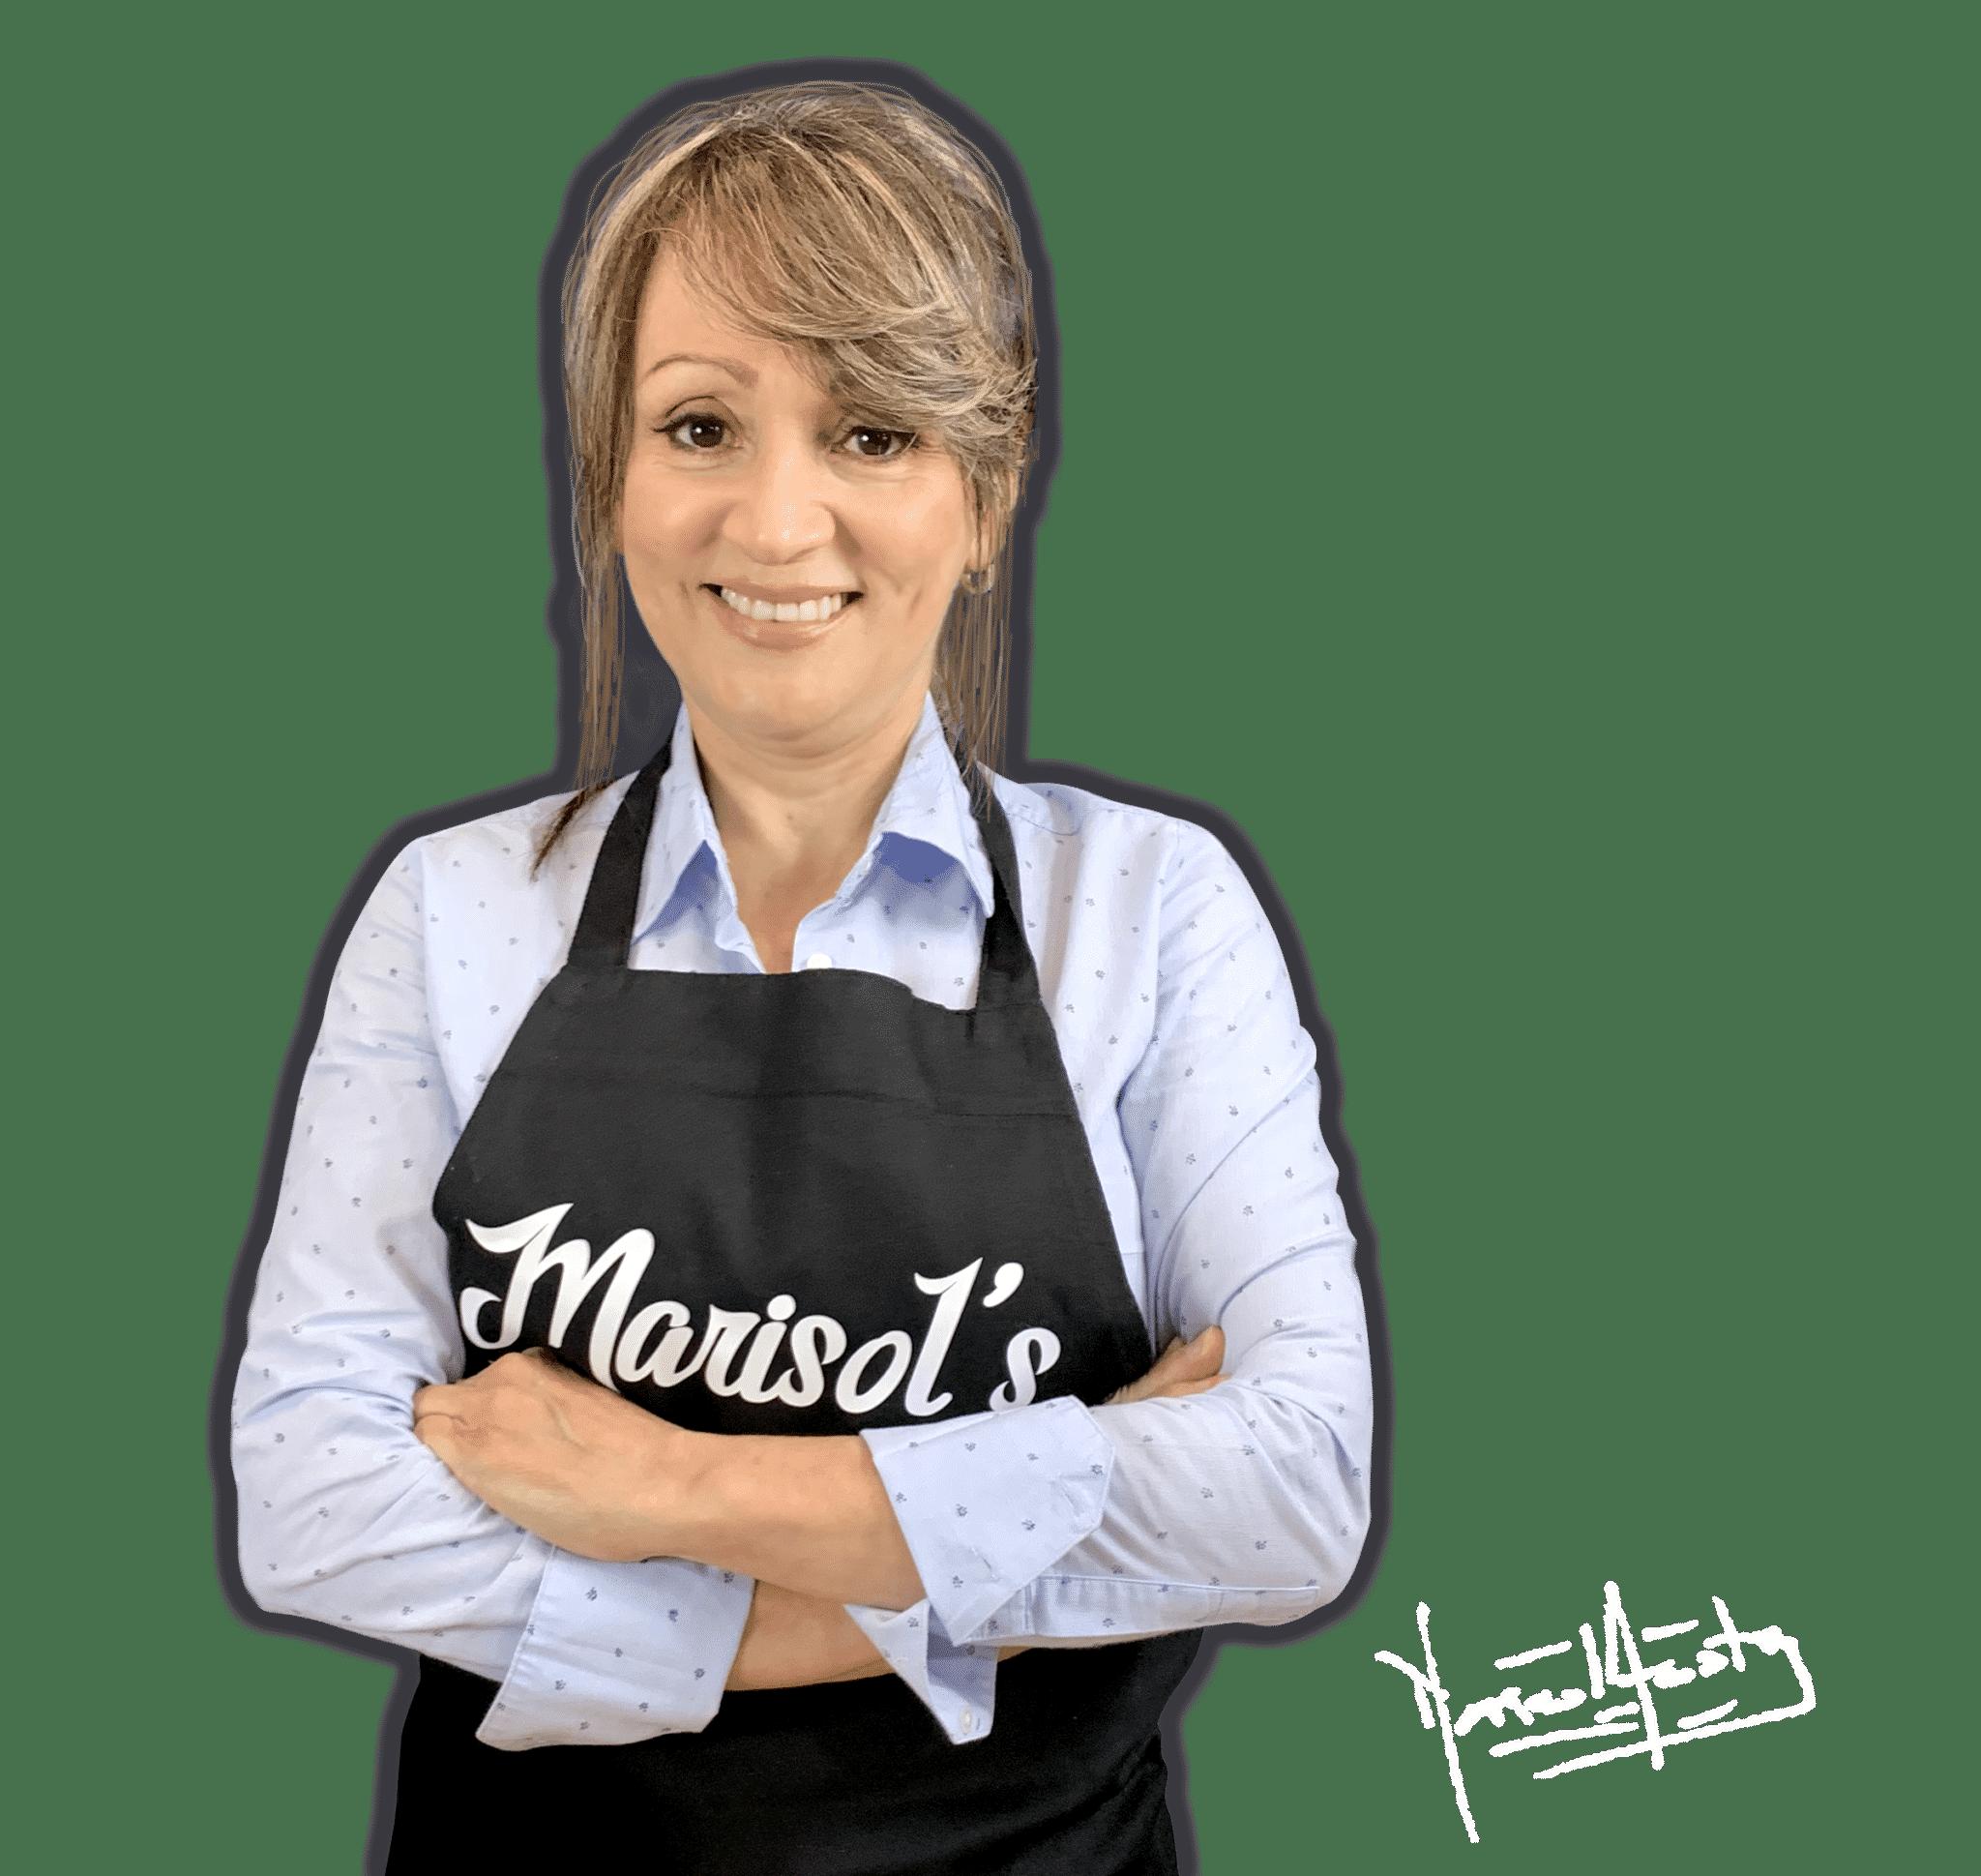 Marisol's Homemade